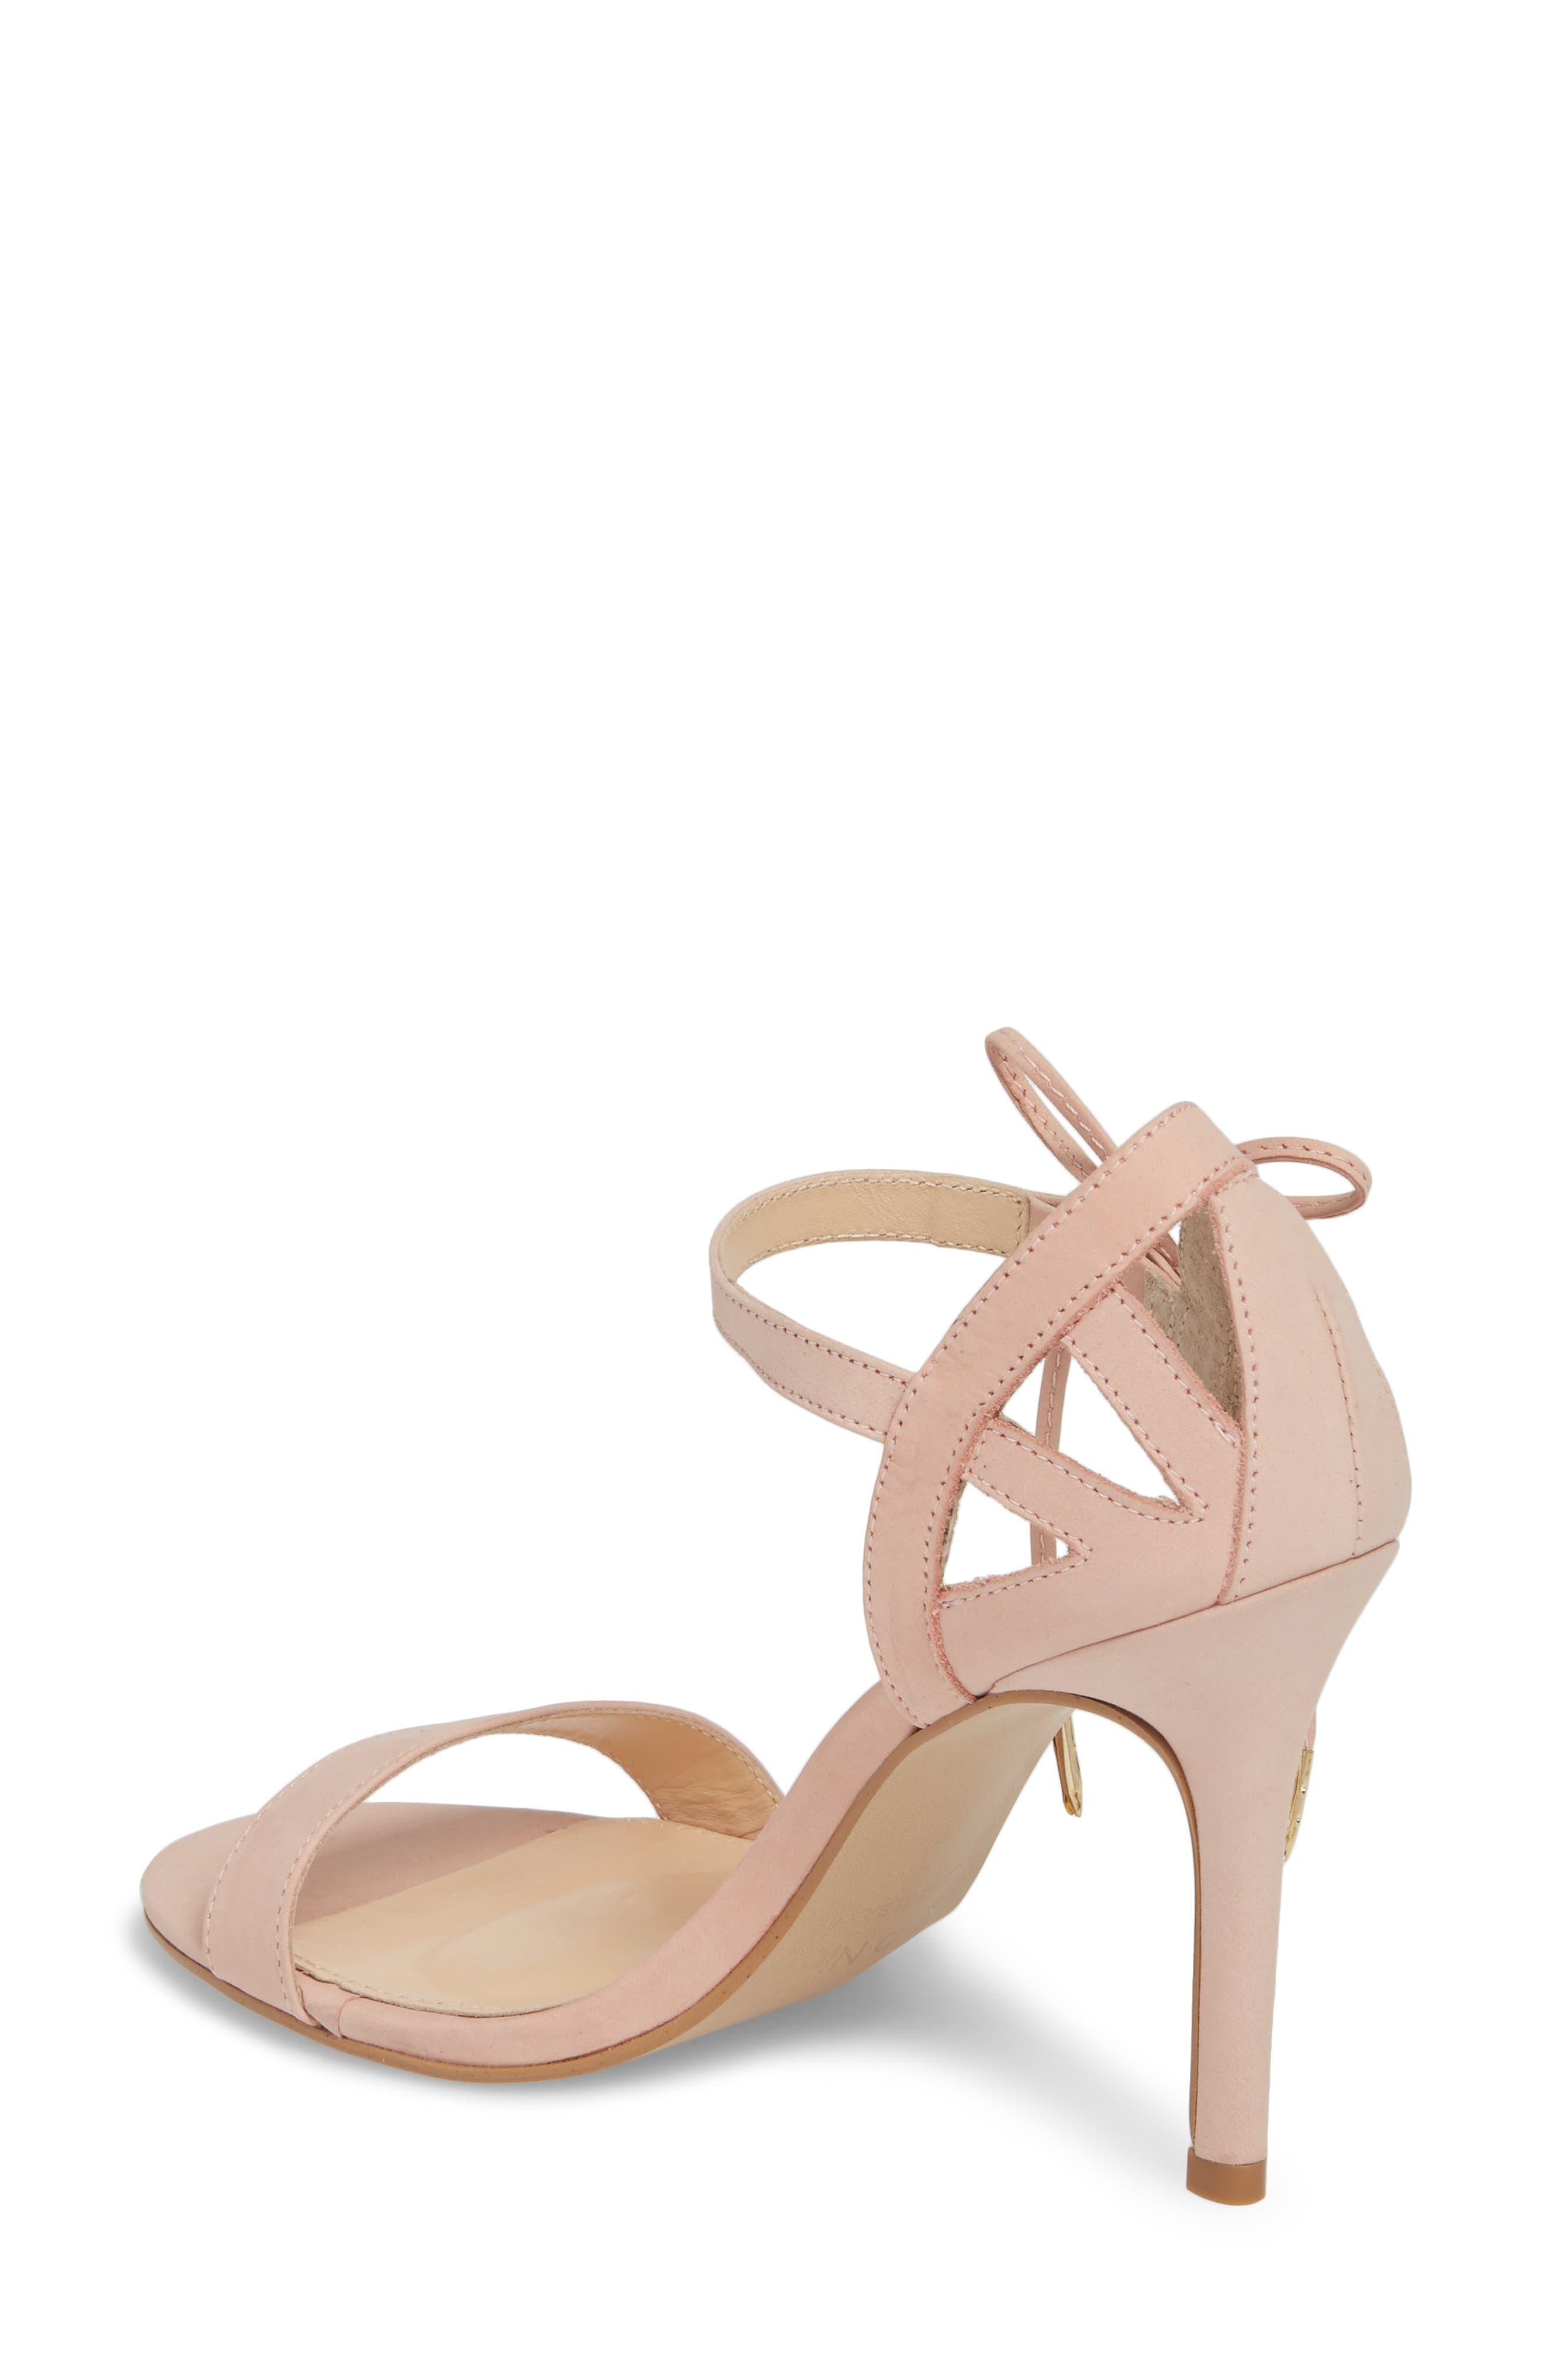 Adelyn Bow Tie Sandal,                             Alternate thumbnail 2, color,                             Quartz Leather